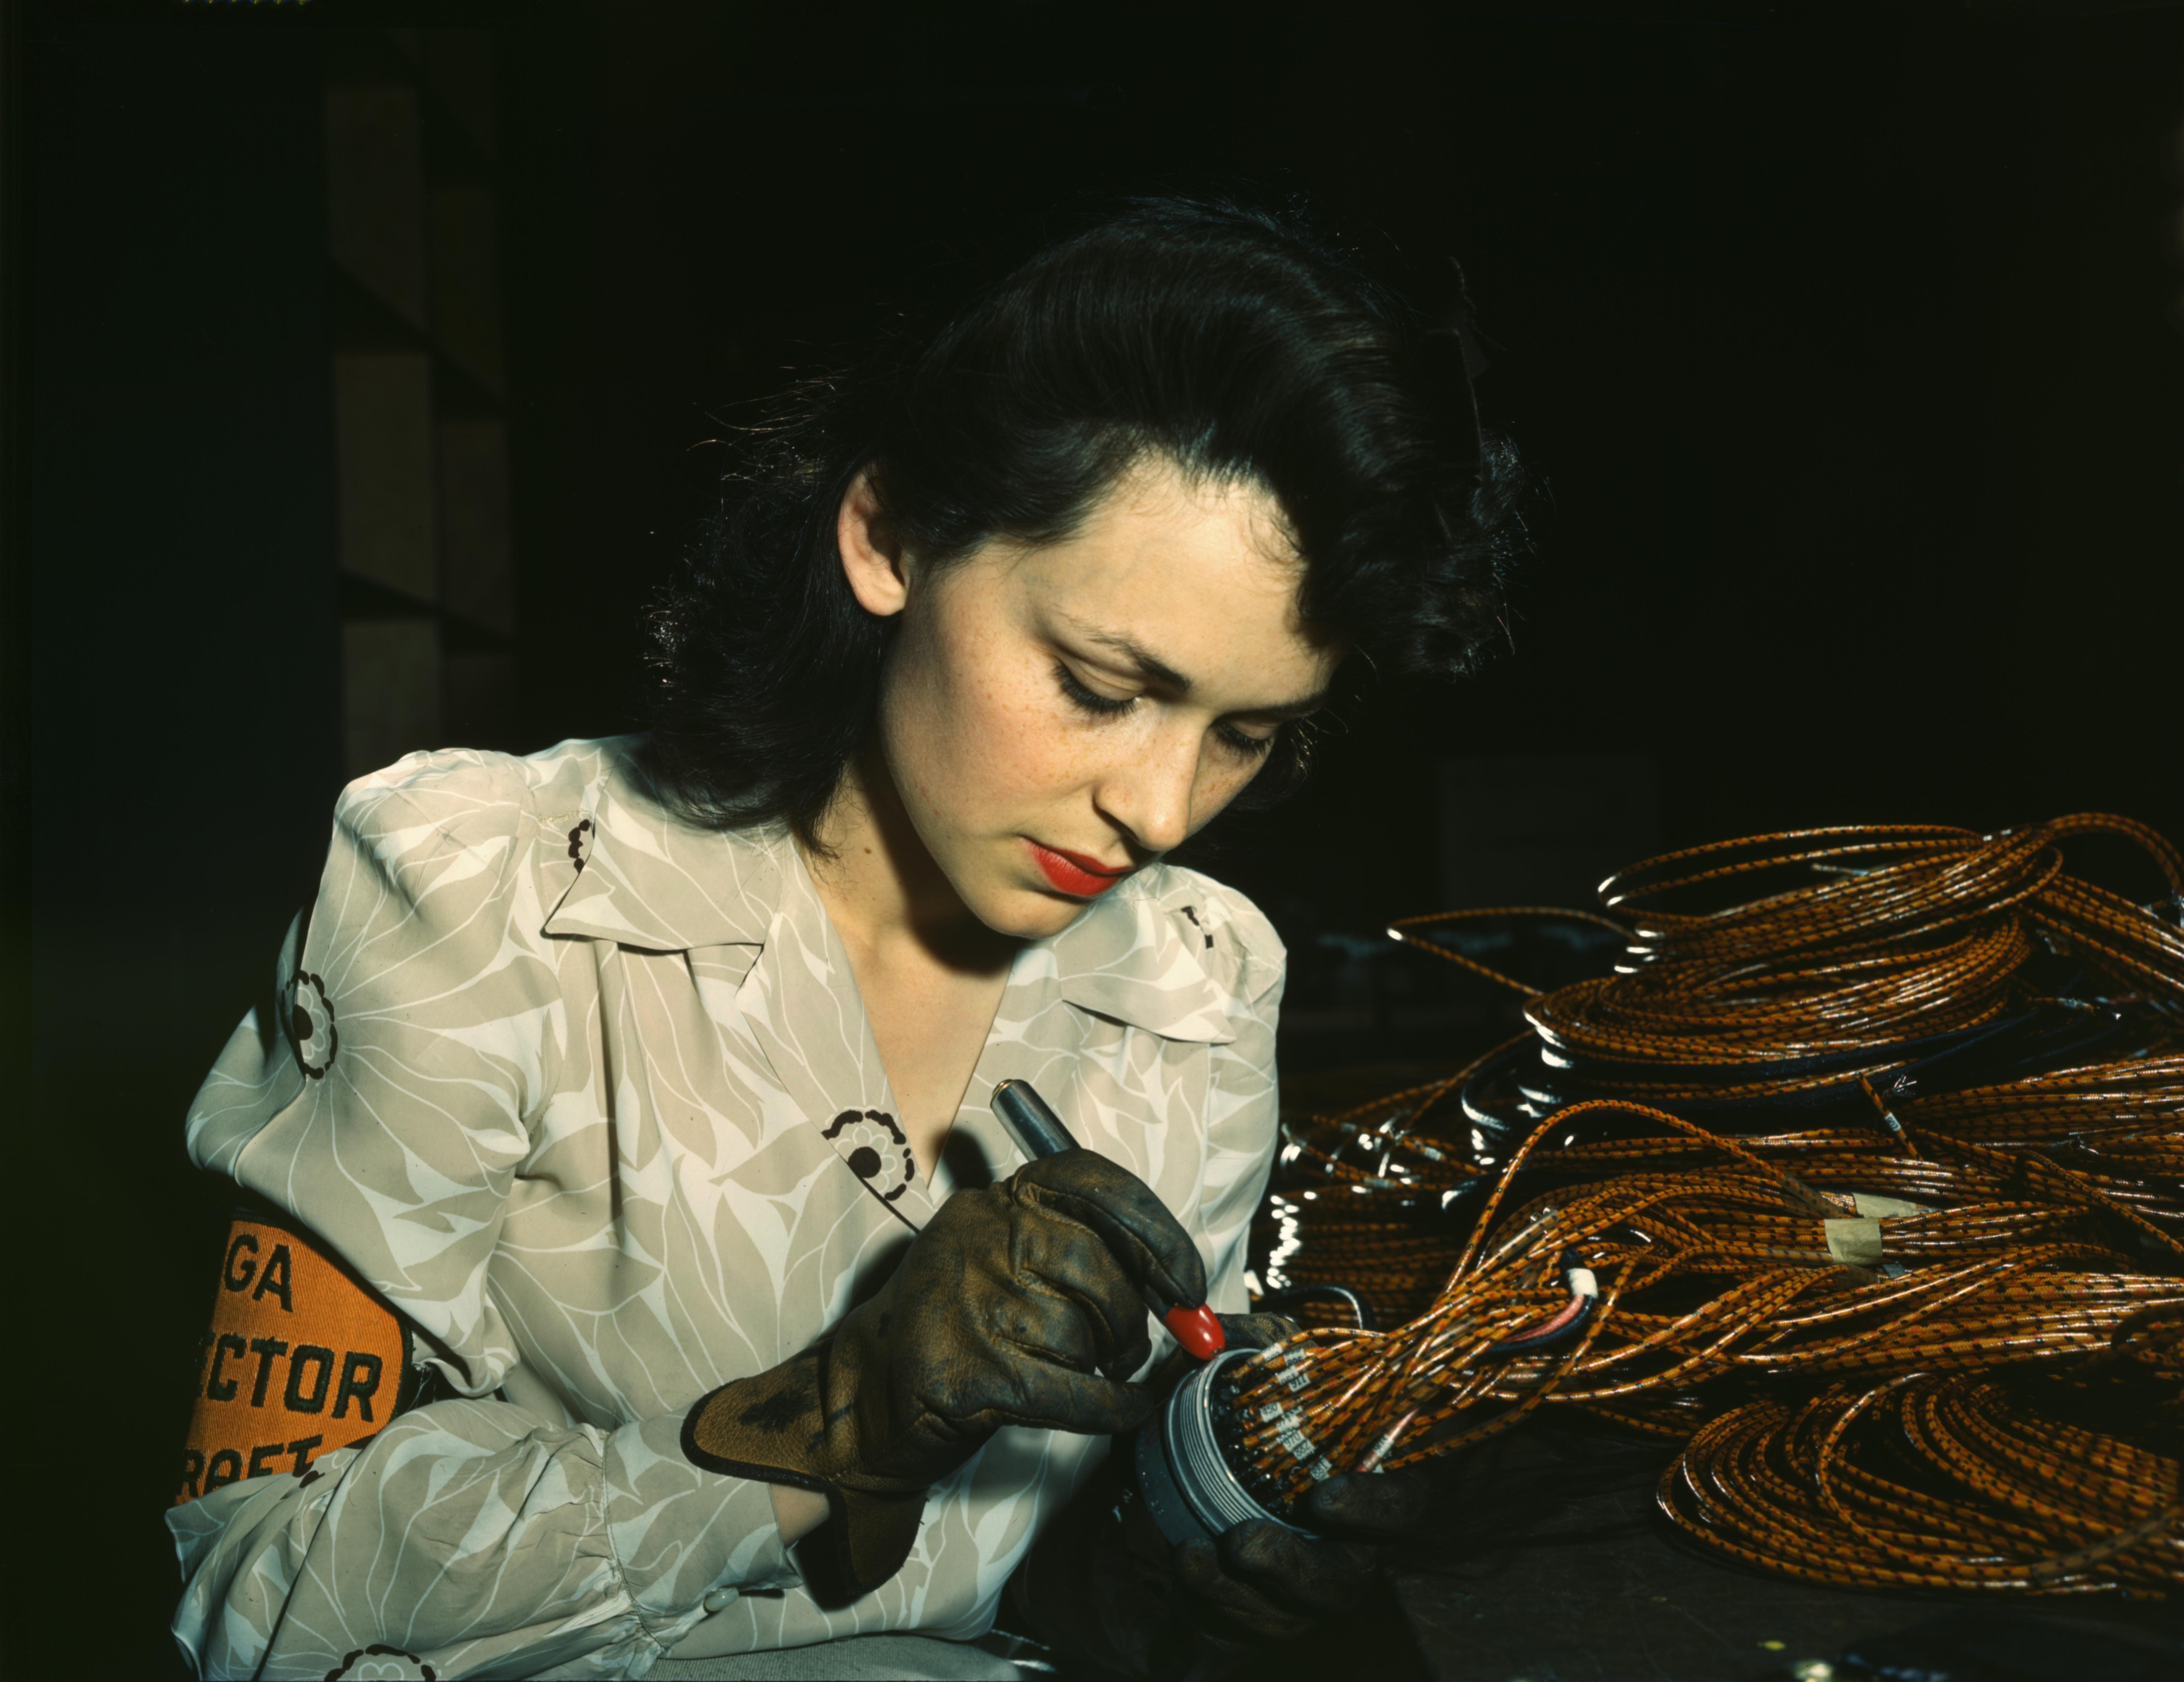 Woman aircraft worker checking assemblies at the Vega Aircraft Corporation in Burbank, California. Photograph by David Bransby, June 1942.